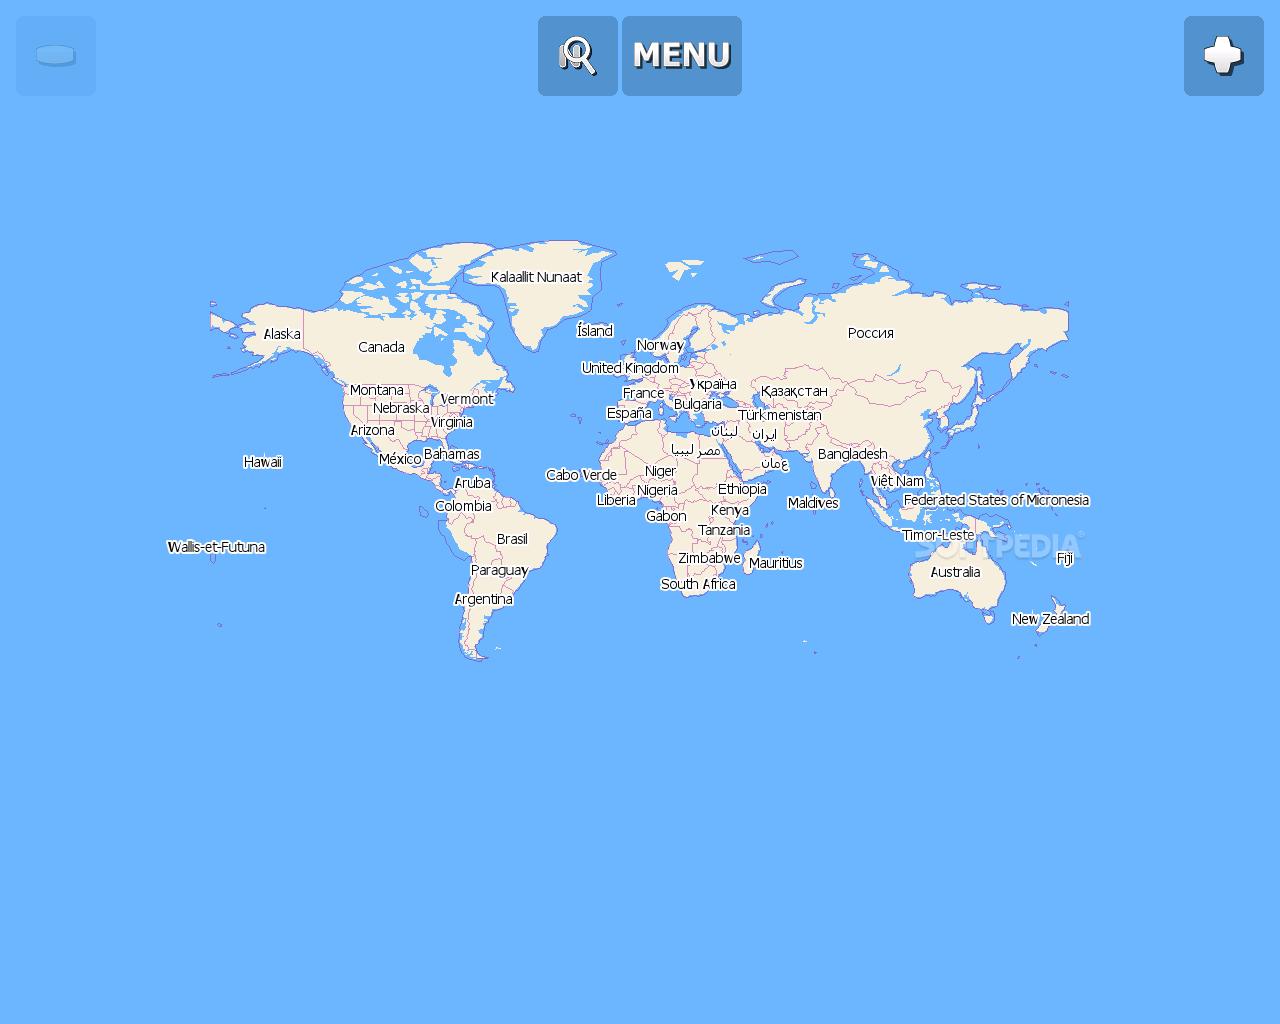 Download mapFactor Navigator Free 17 1 6